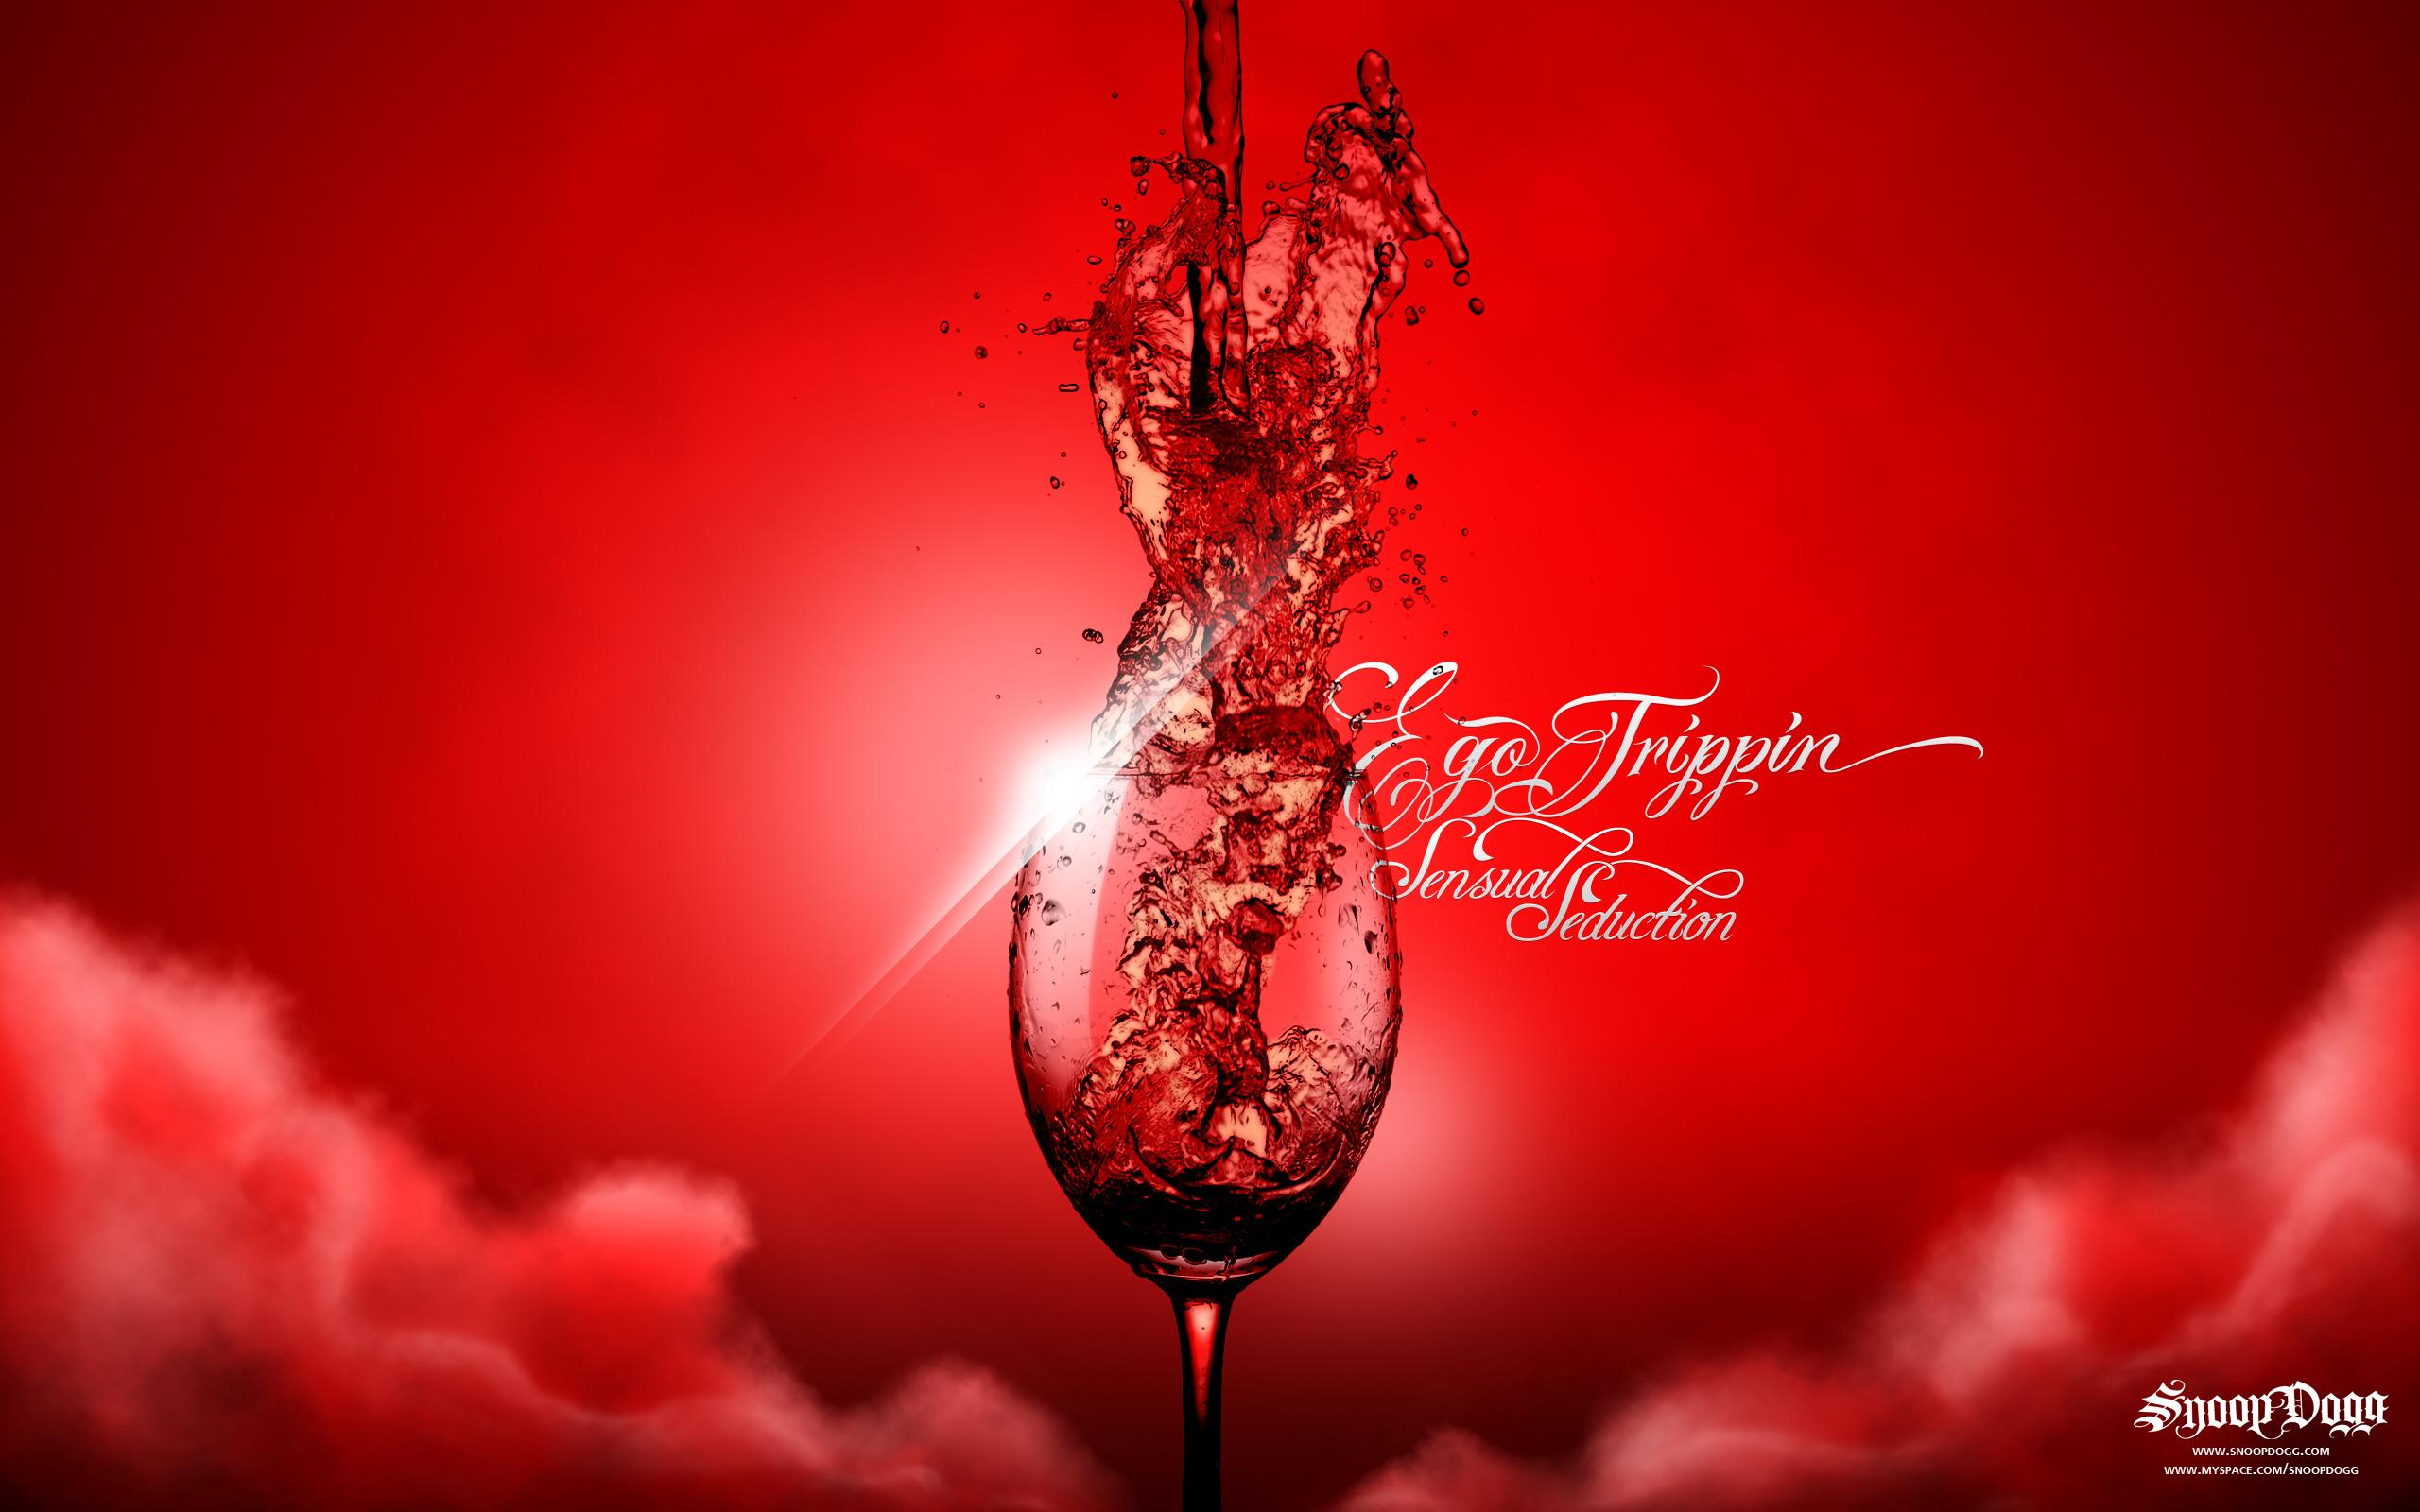 Volim crveno - Page 5 6882-org-Ego%20Trippin%20-%20Sensual%20seduction%20-%20Round%201